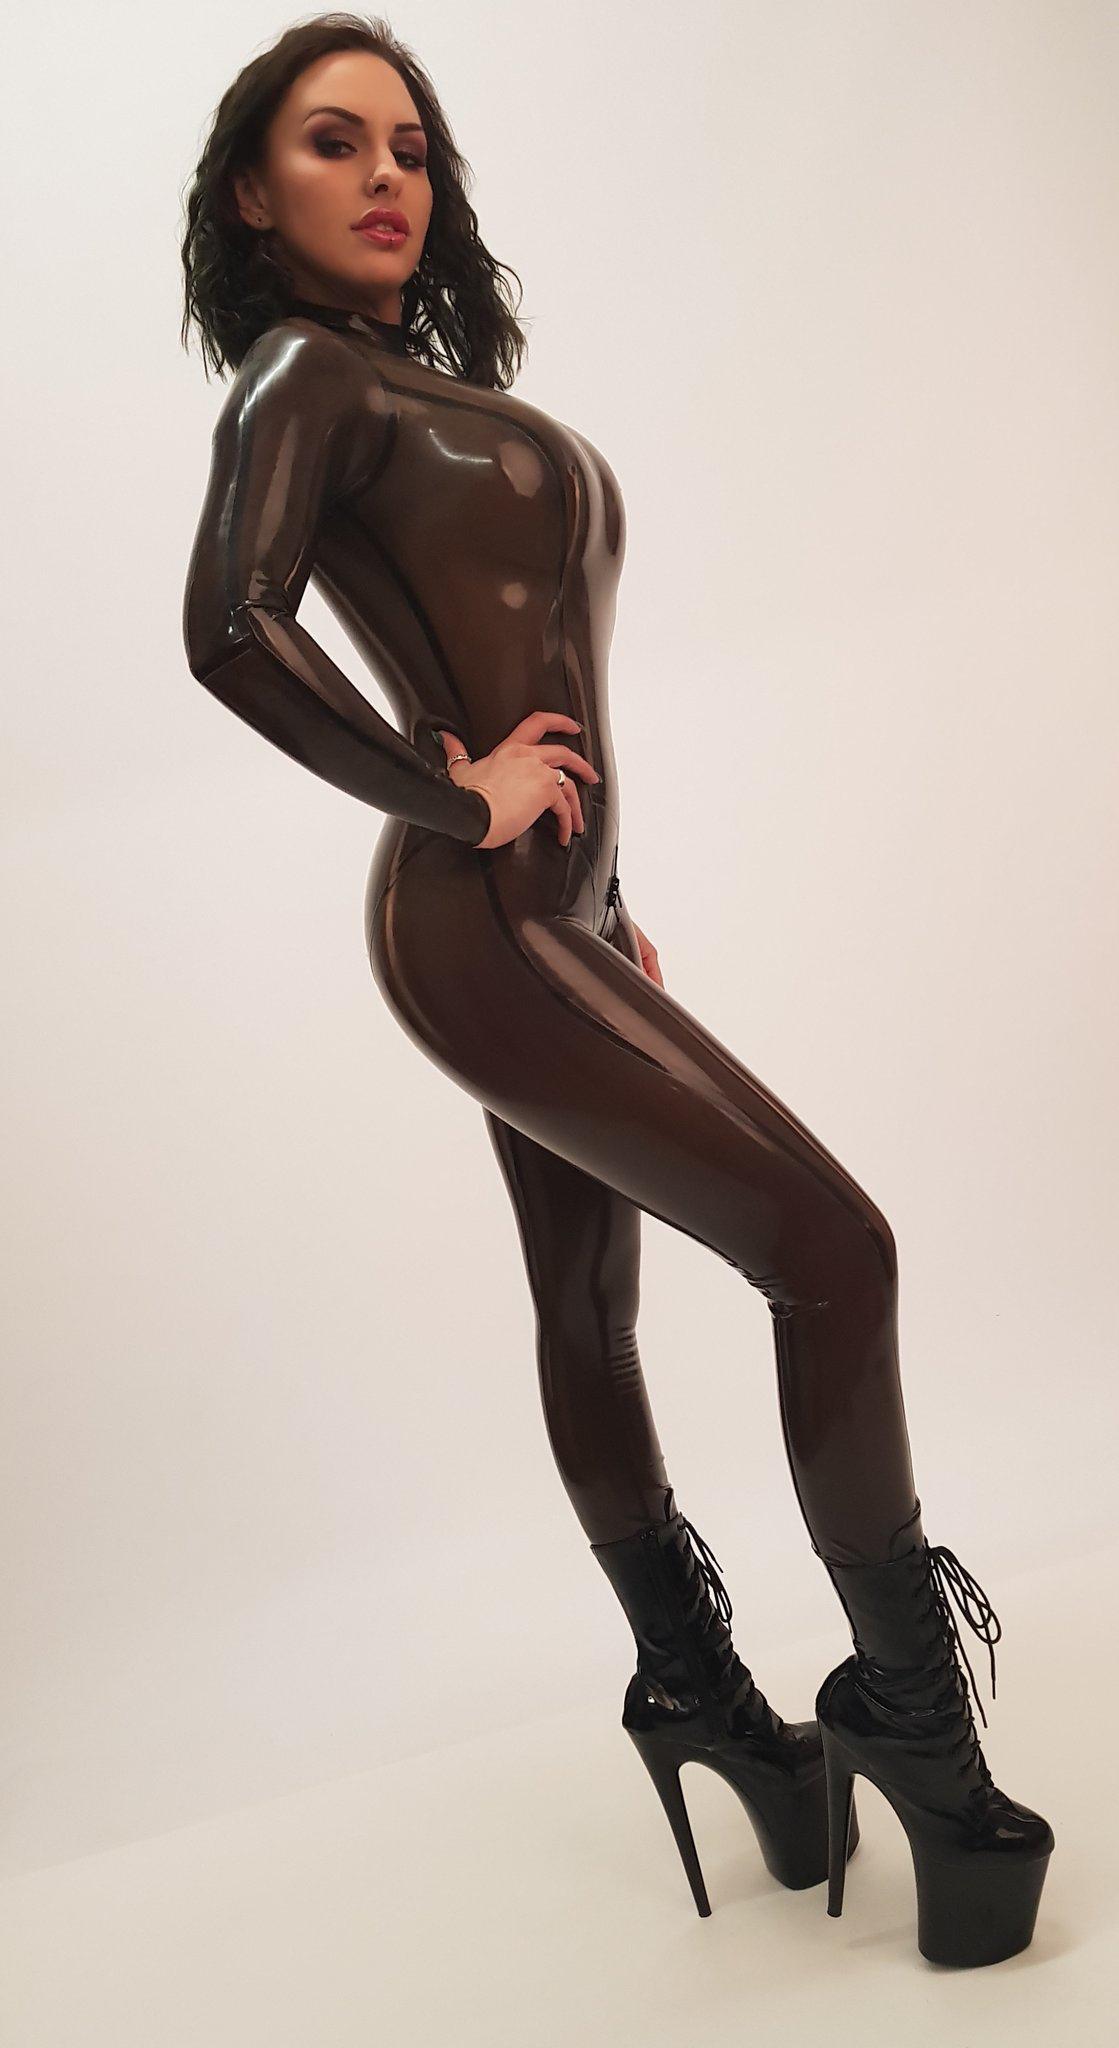 nude (43 photos), Leaked Celebrites photo